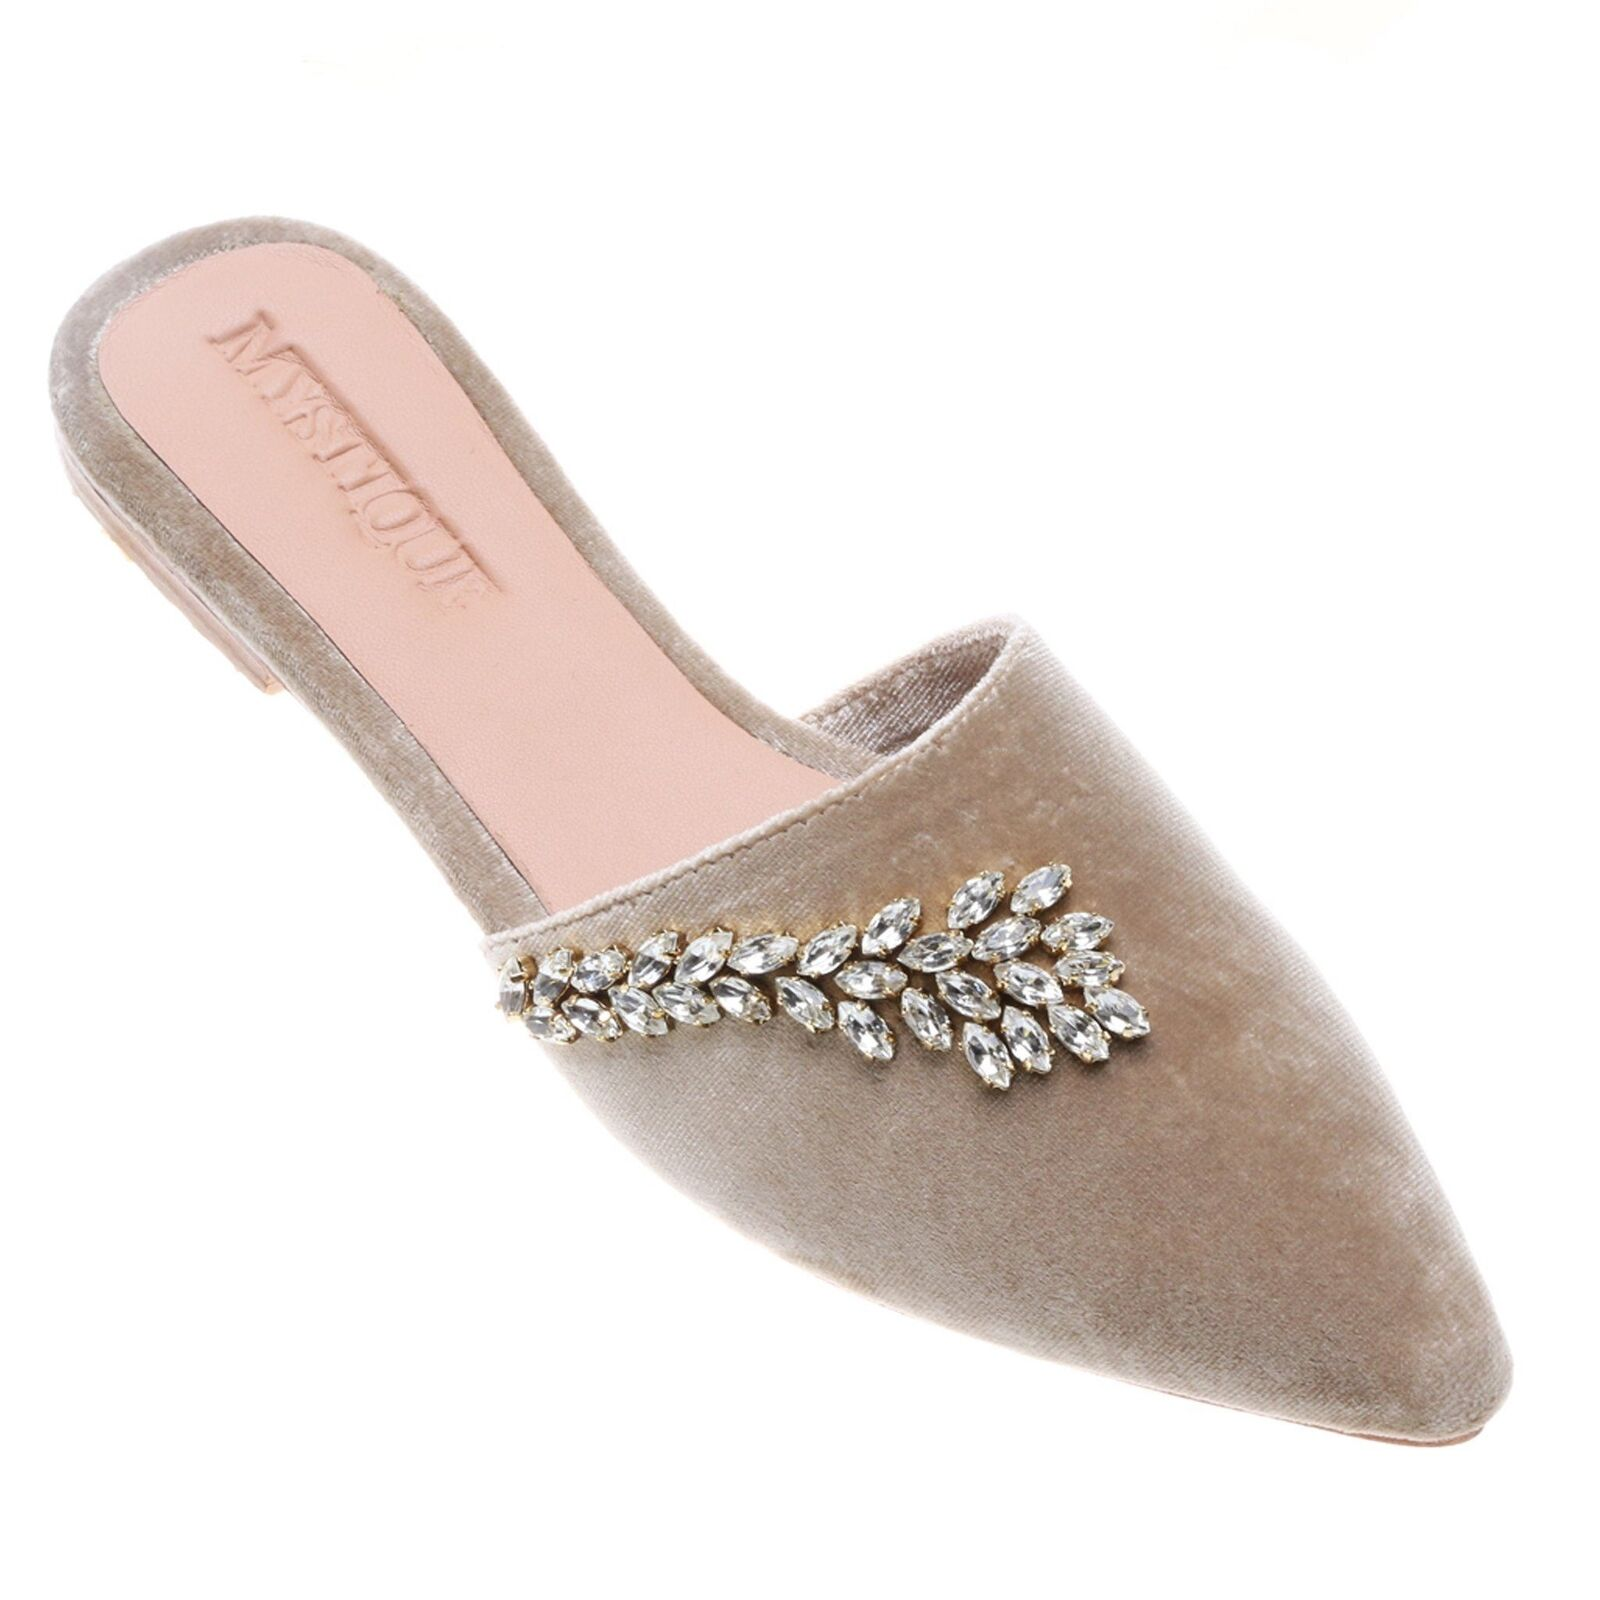 MYSTIQUE Alaska Nude Velvet Emellited Crystal  Mules Sandals Flats  qualità autentica